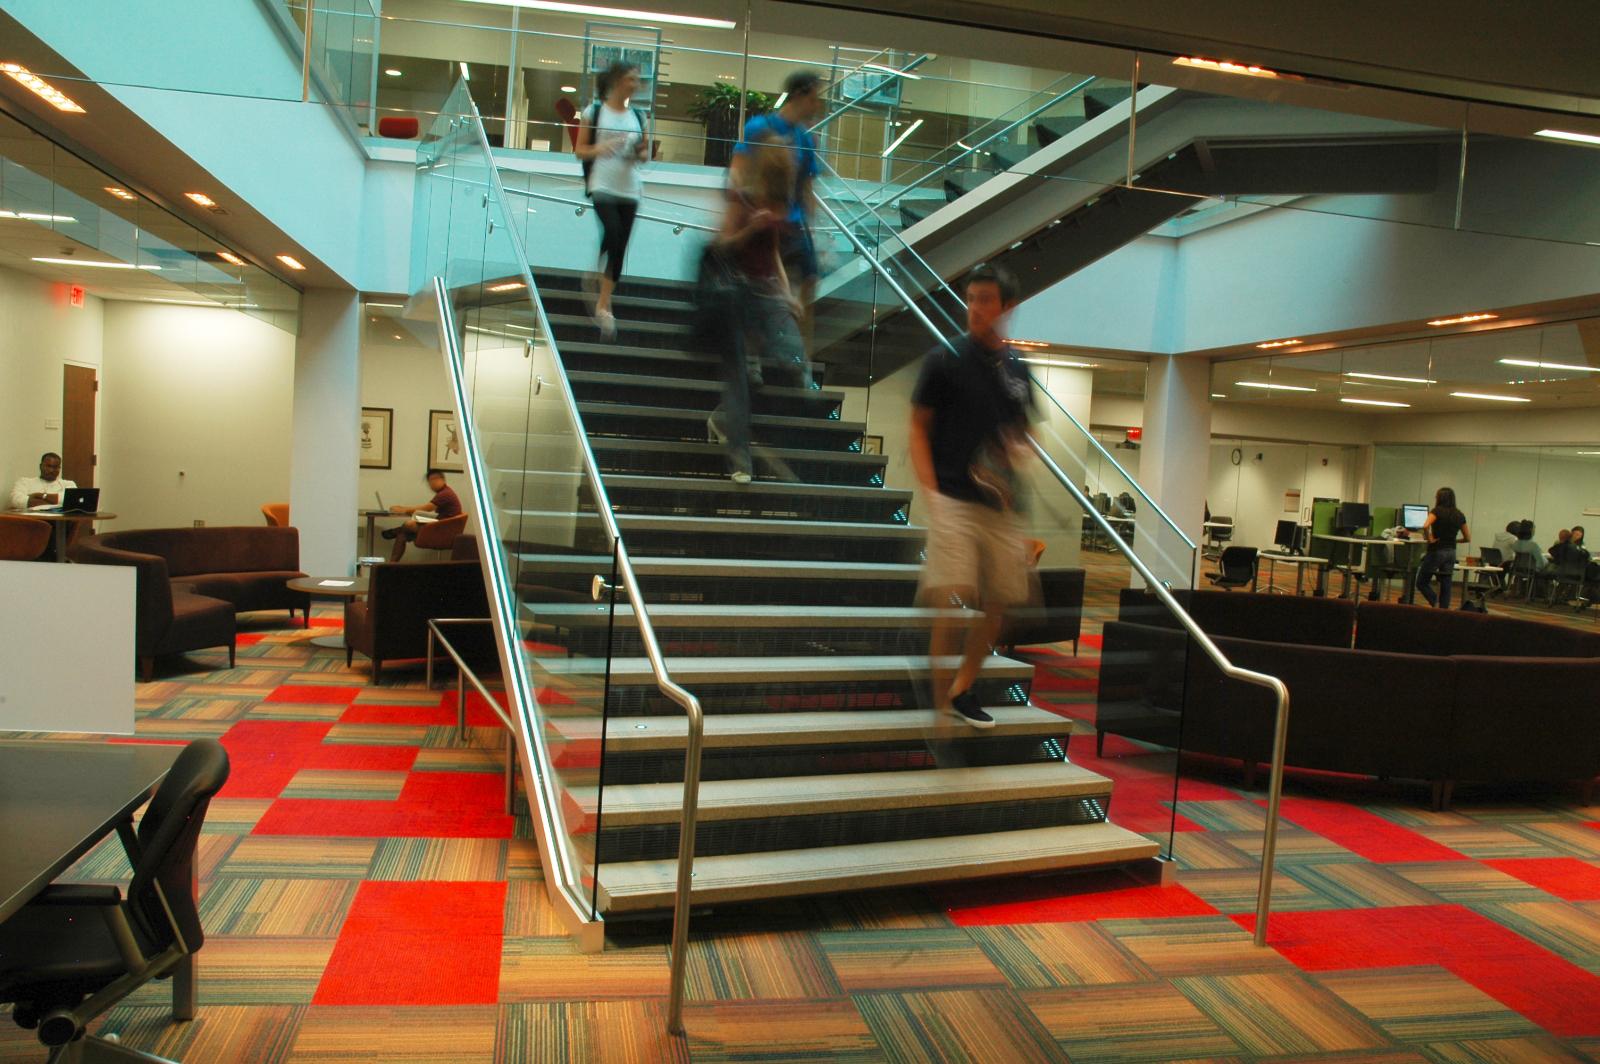 University of Arizona Law Library staircase